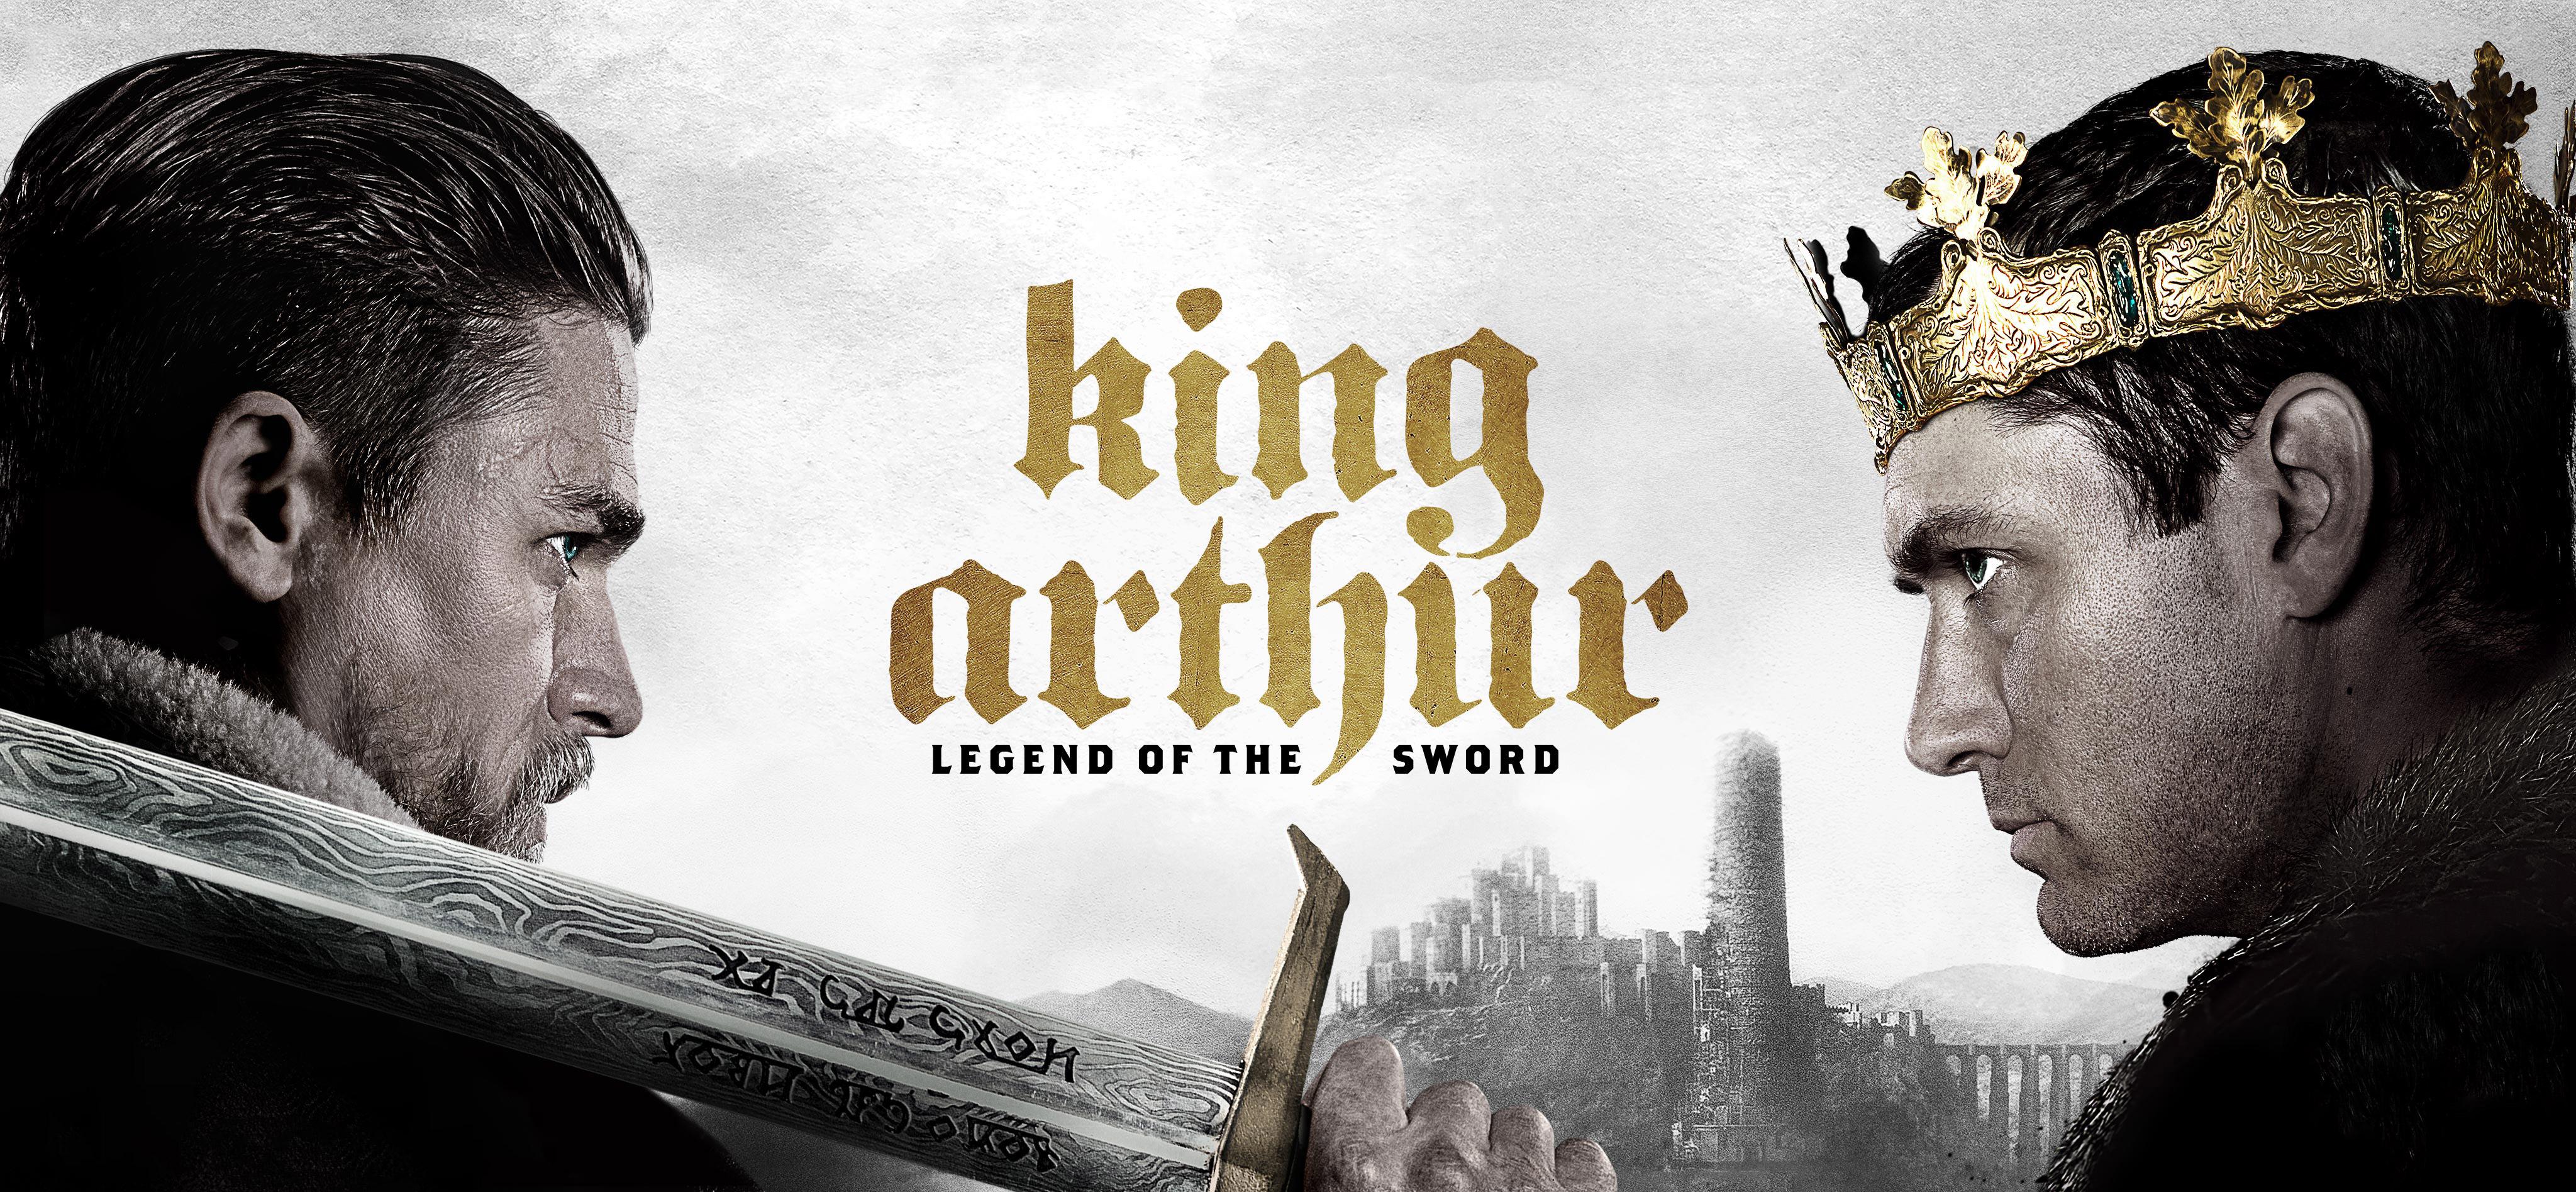 King Arthur Legend of the Sword Image